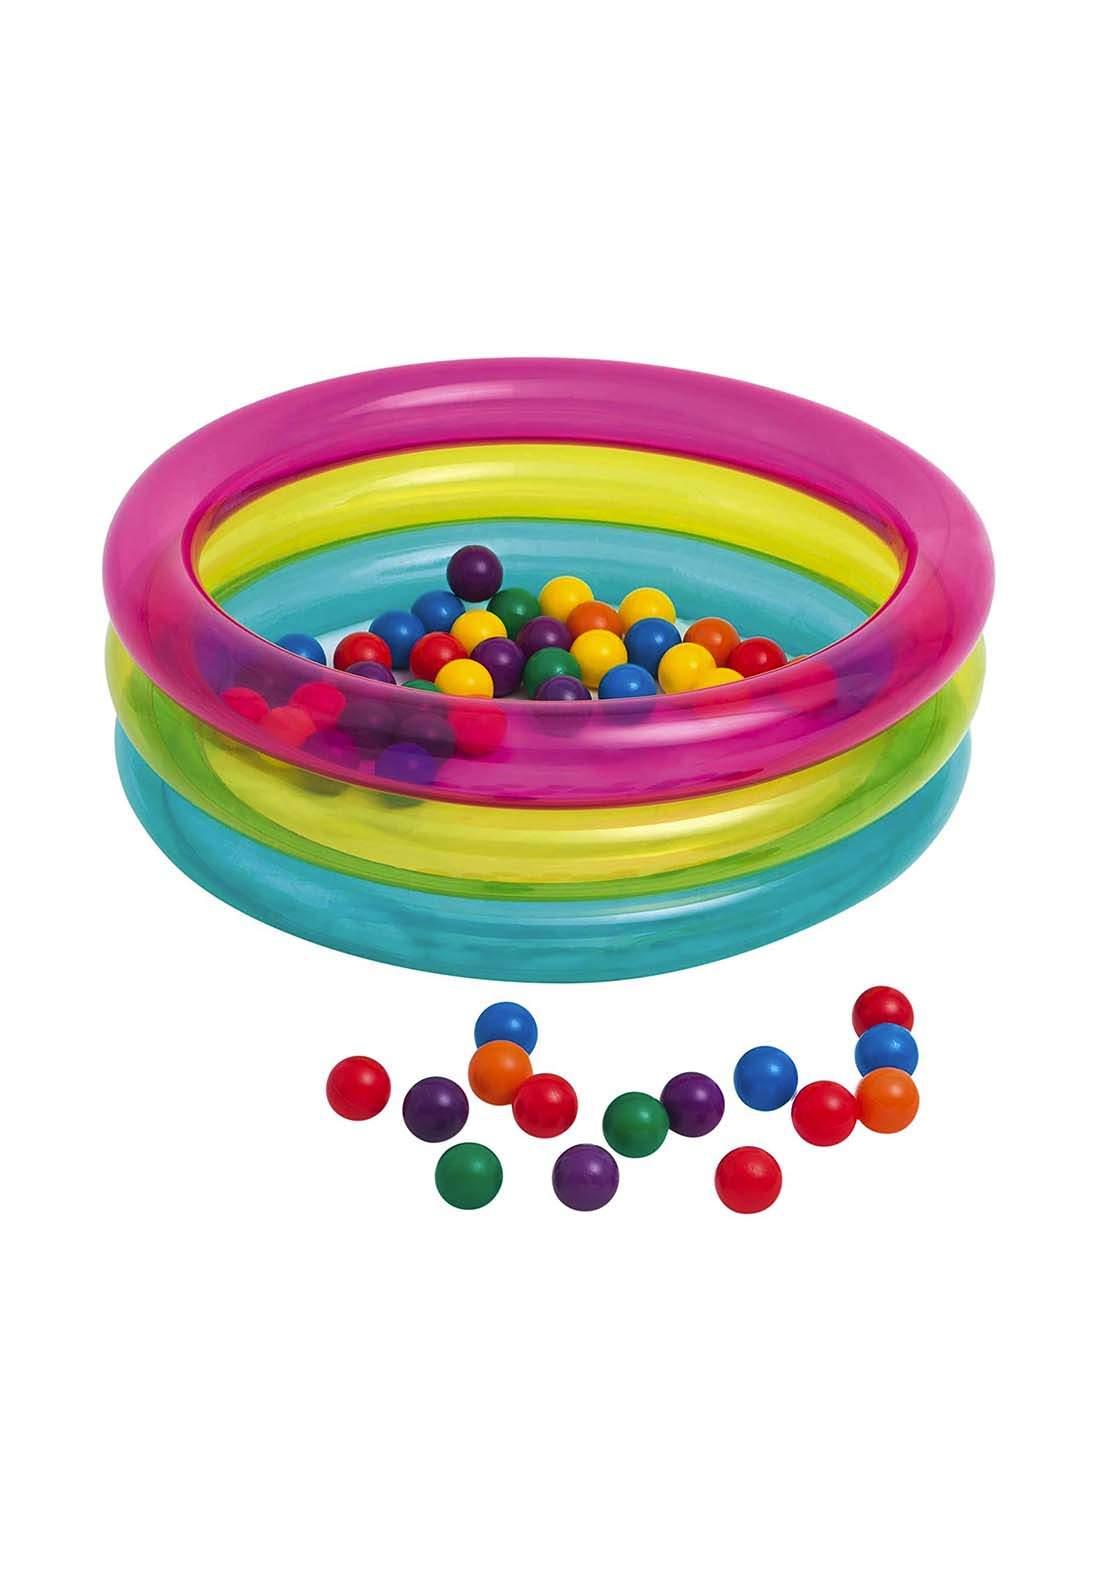 Intex 48674NP Children's 3-Ring Inflatable Baby Ball Pit مسبح مع كرات للعب